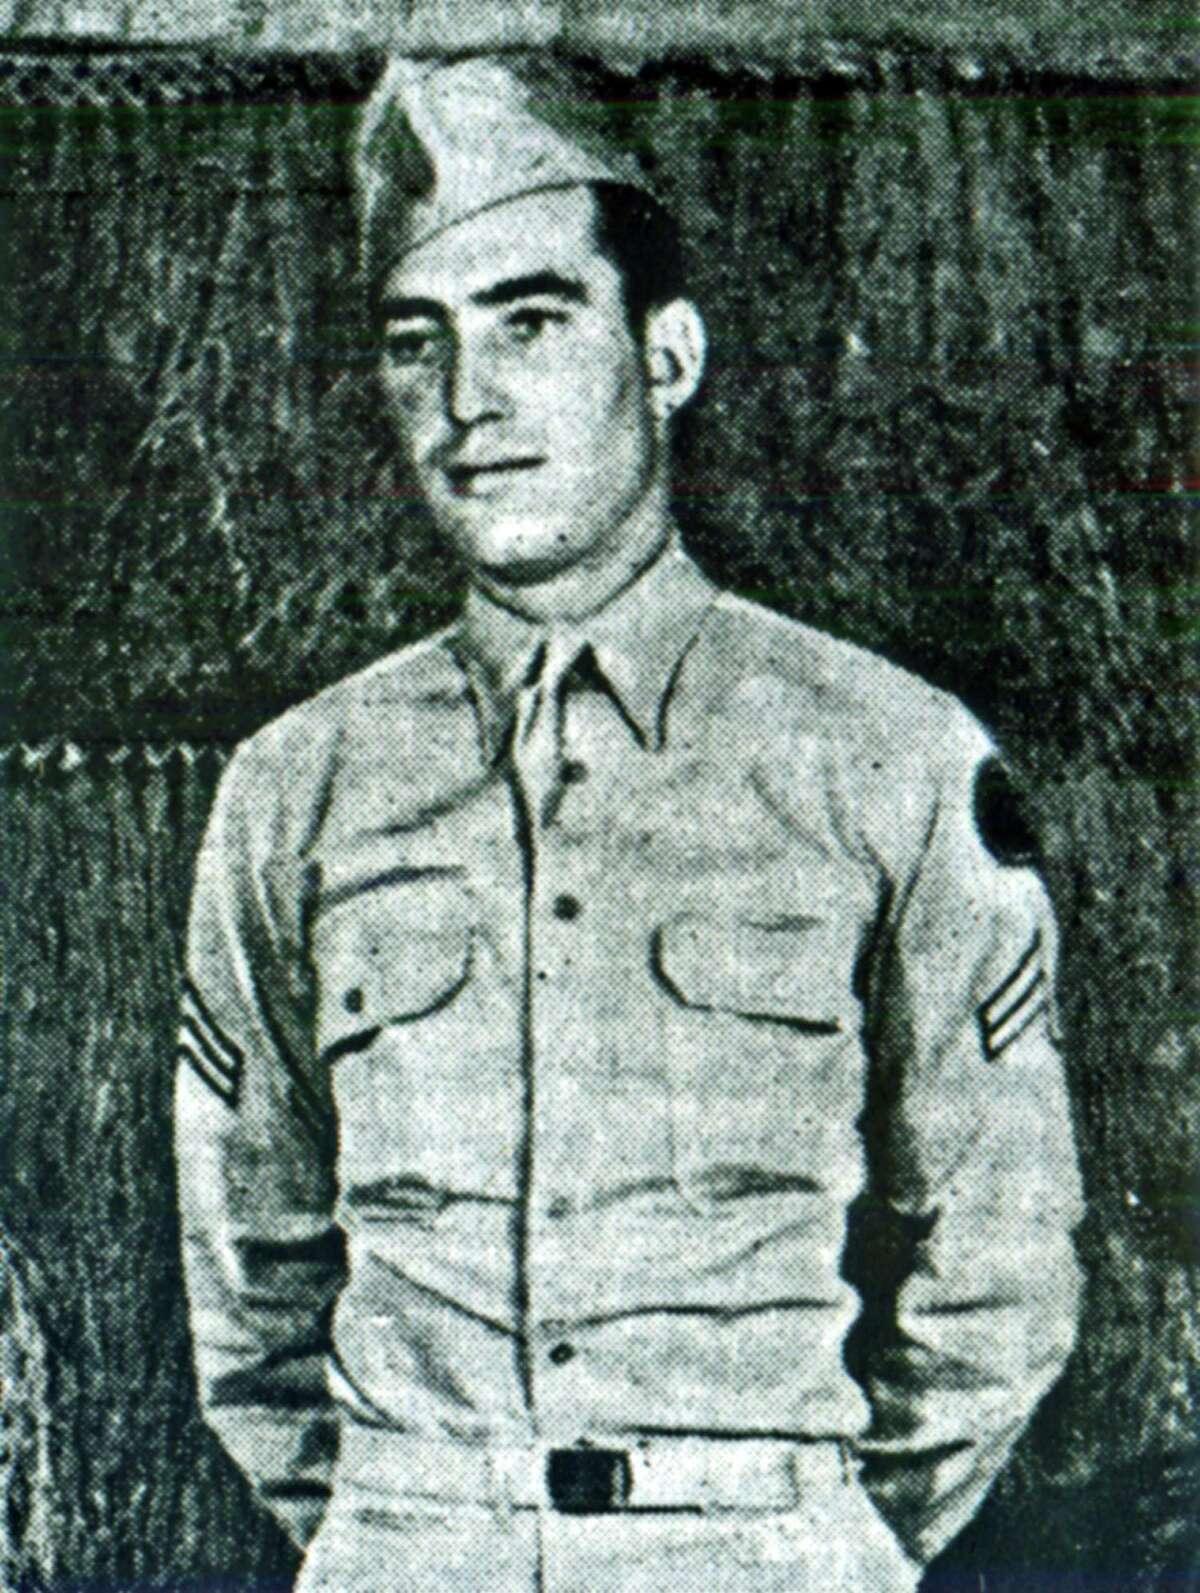 Sgt. John E. Hurlburt